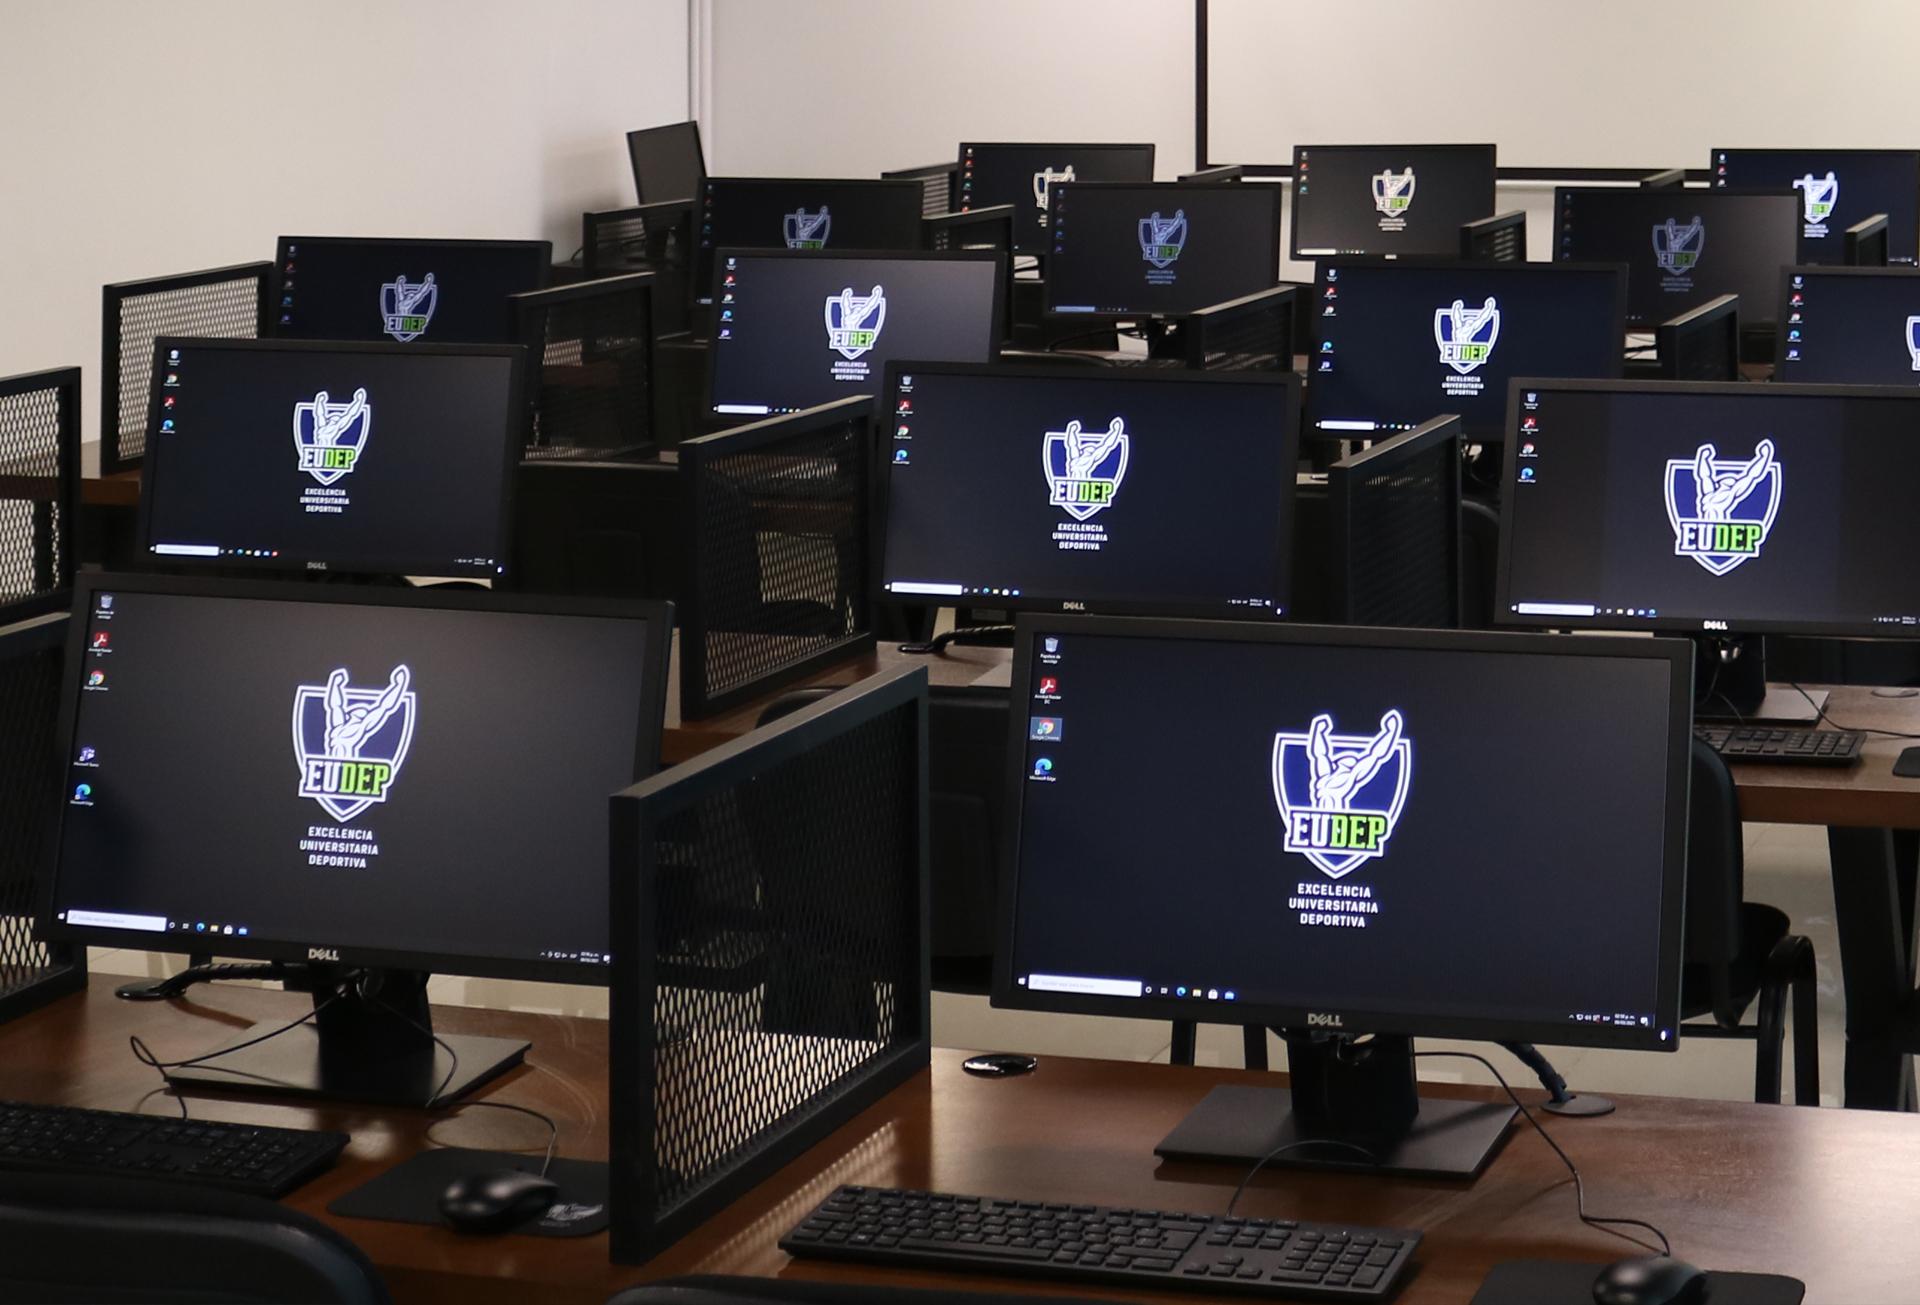 computo-eudep